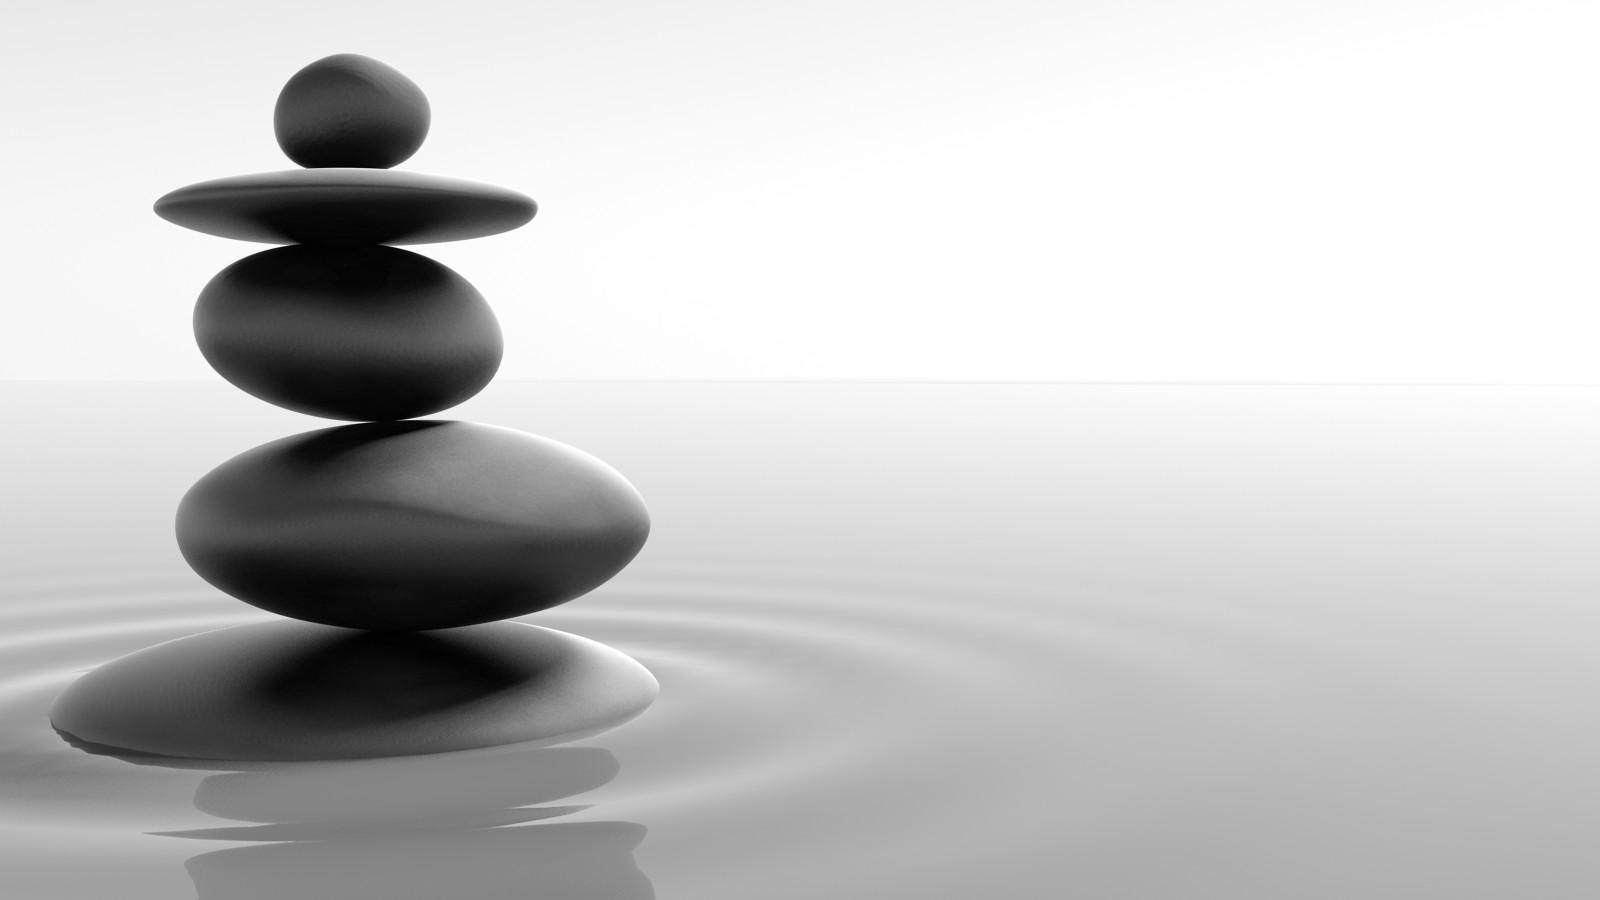 zen tao stones wallpaper balance peace 1600x900